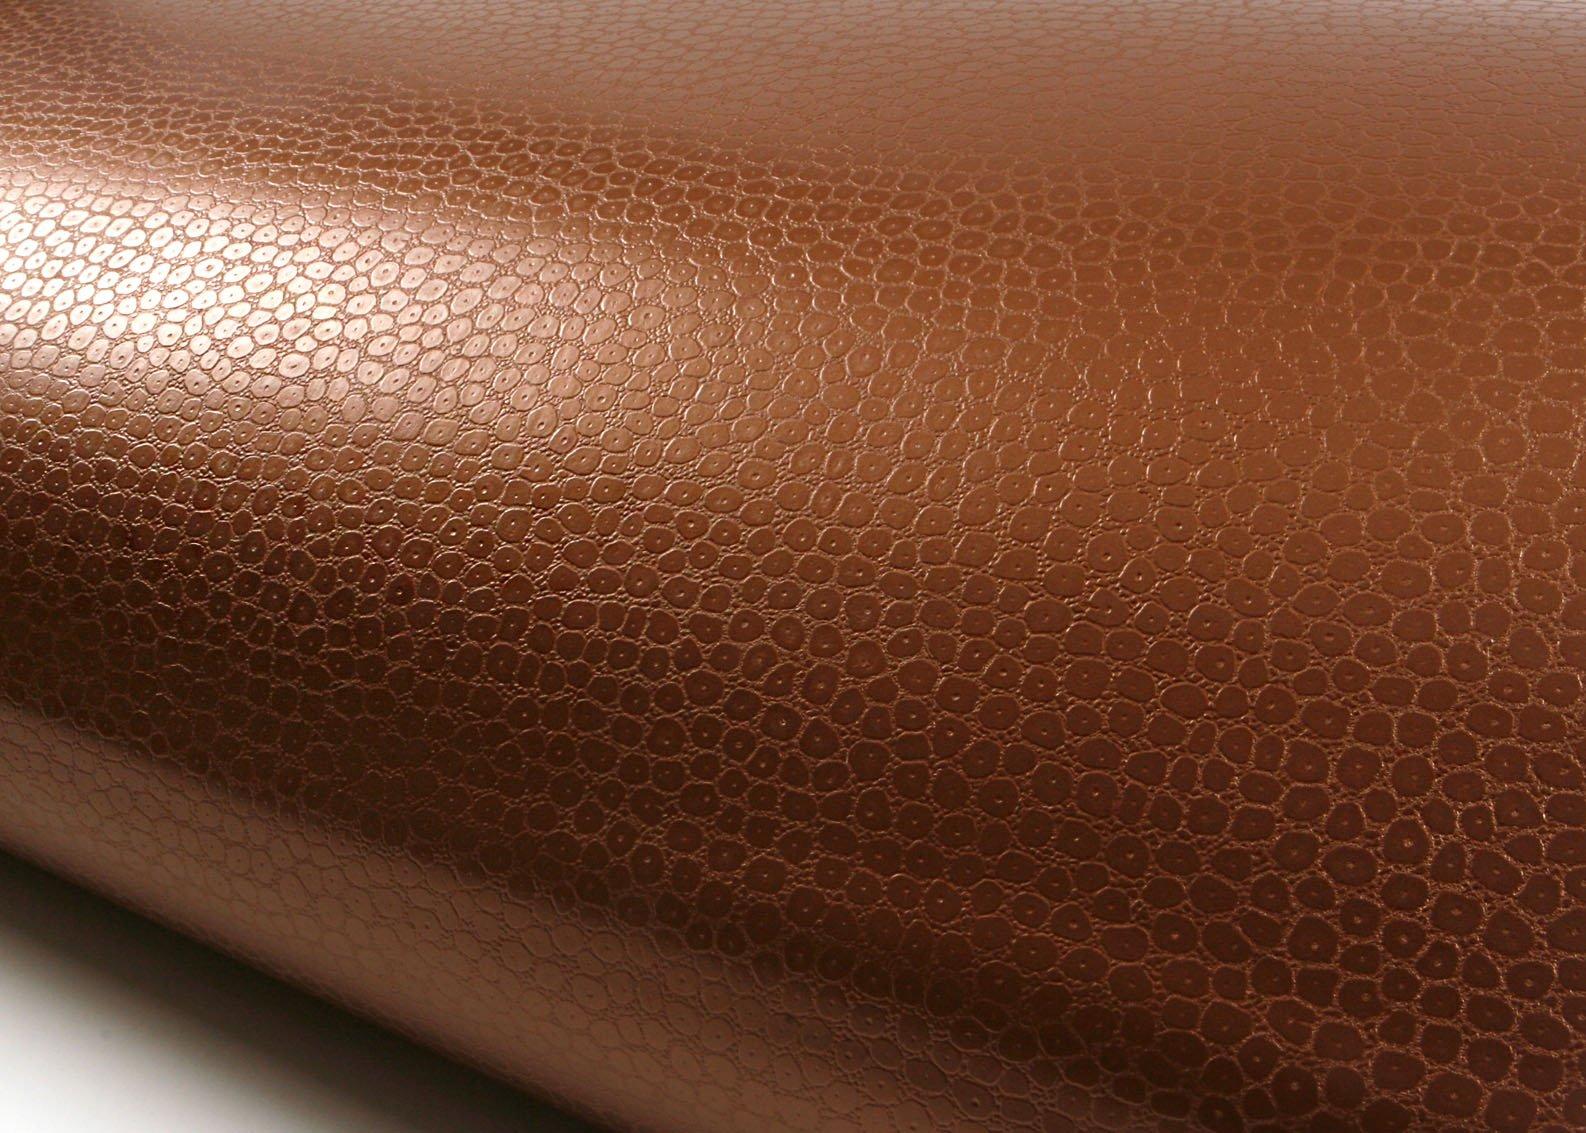 ROSEROSA Peel & Stick Backsplash Crocodile Tiger Camel Leather Textured Vinyl Contact Paper Self-Adhesive Wallpaper Shelf Liner Table Door Reform (MF5600-1 : 1.98 Feet X 6.56 Feet)